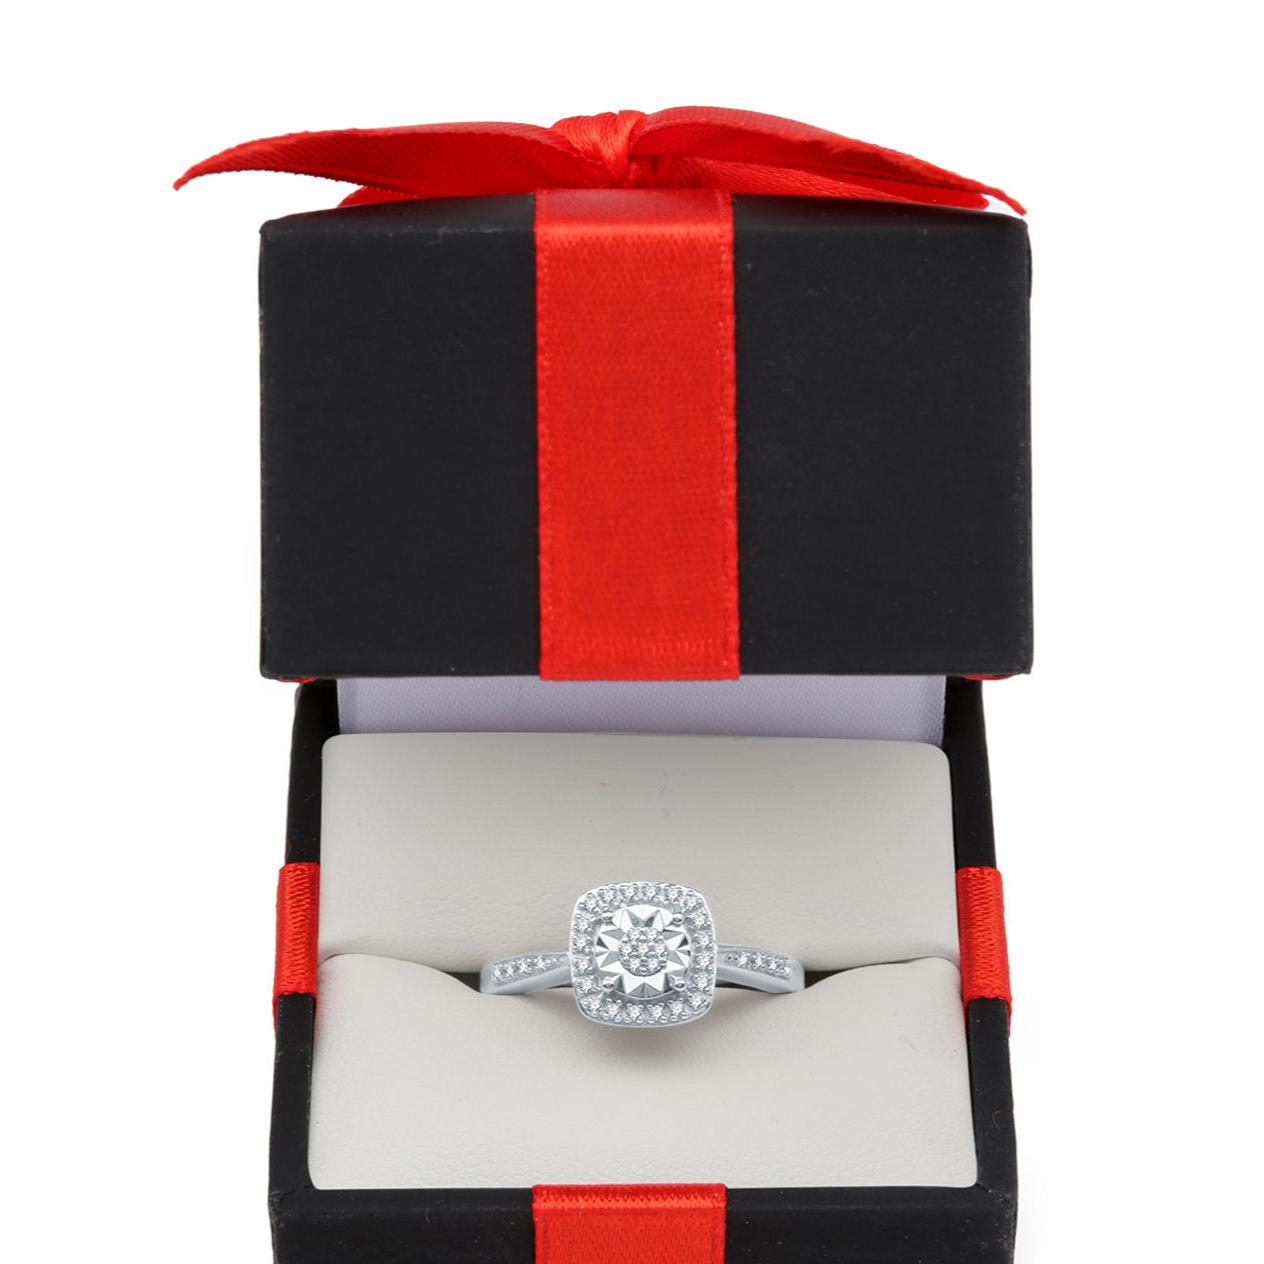 Diamond Jewelry Boxed Sets $20